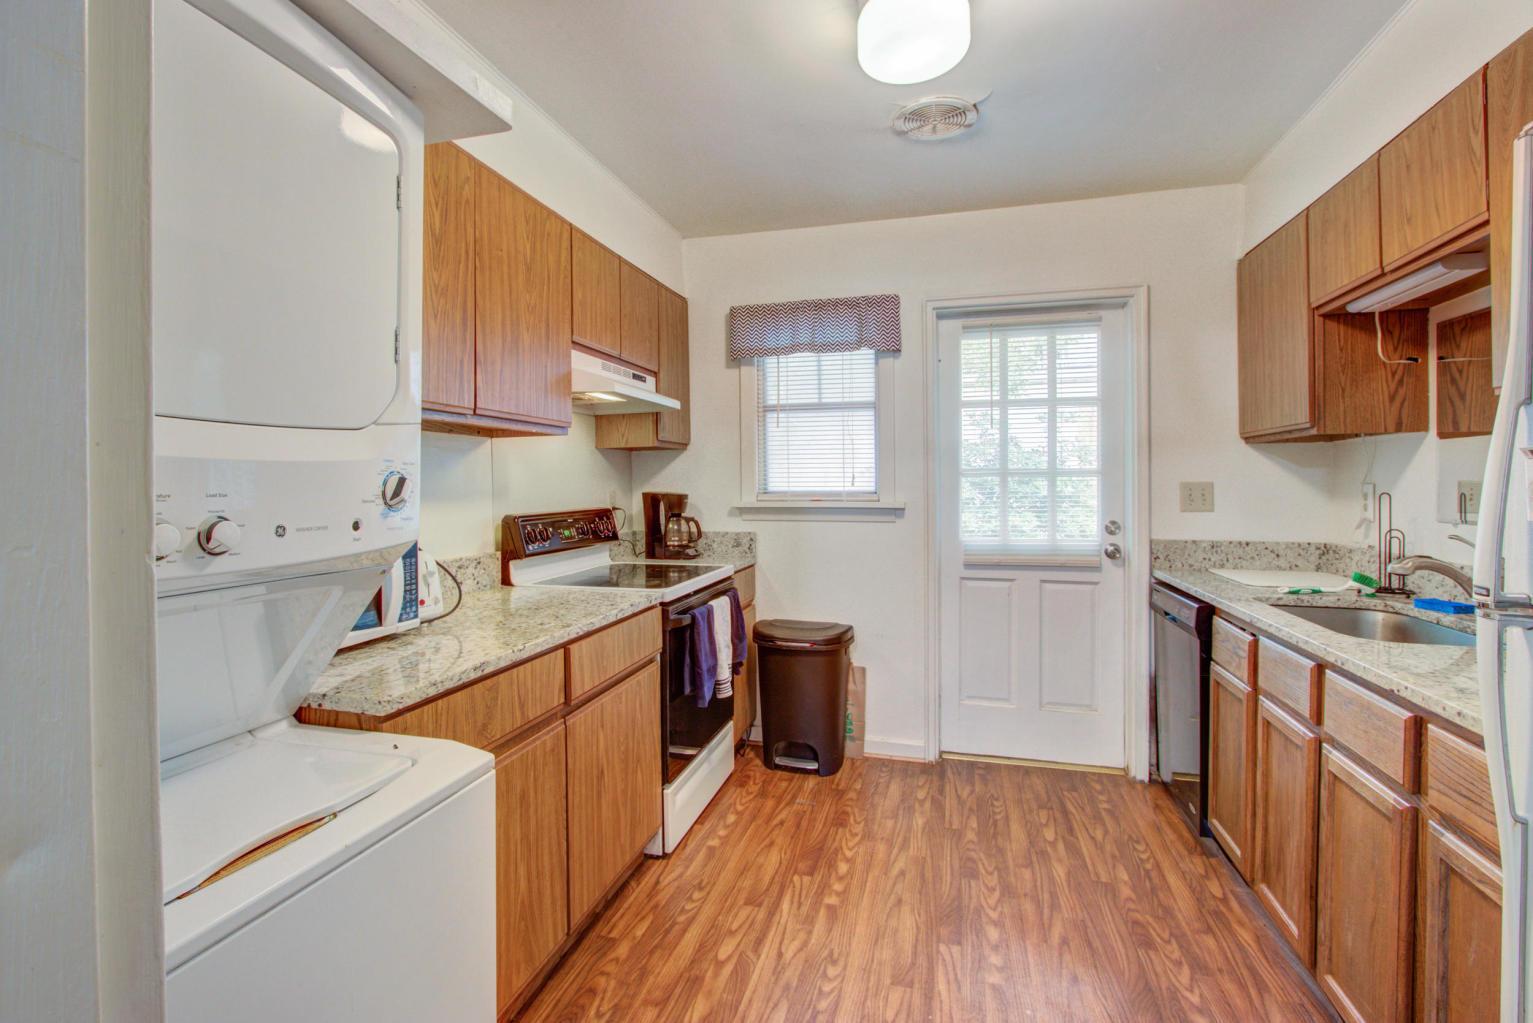 Rutledge Green Condos For Sale - 173 Rutledge, Charleston, SC - 18